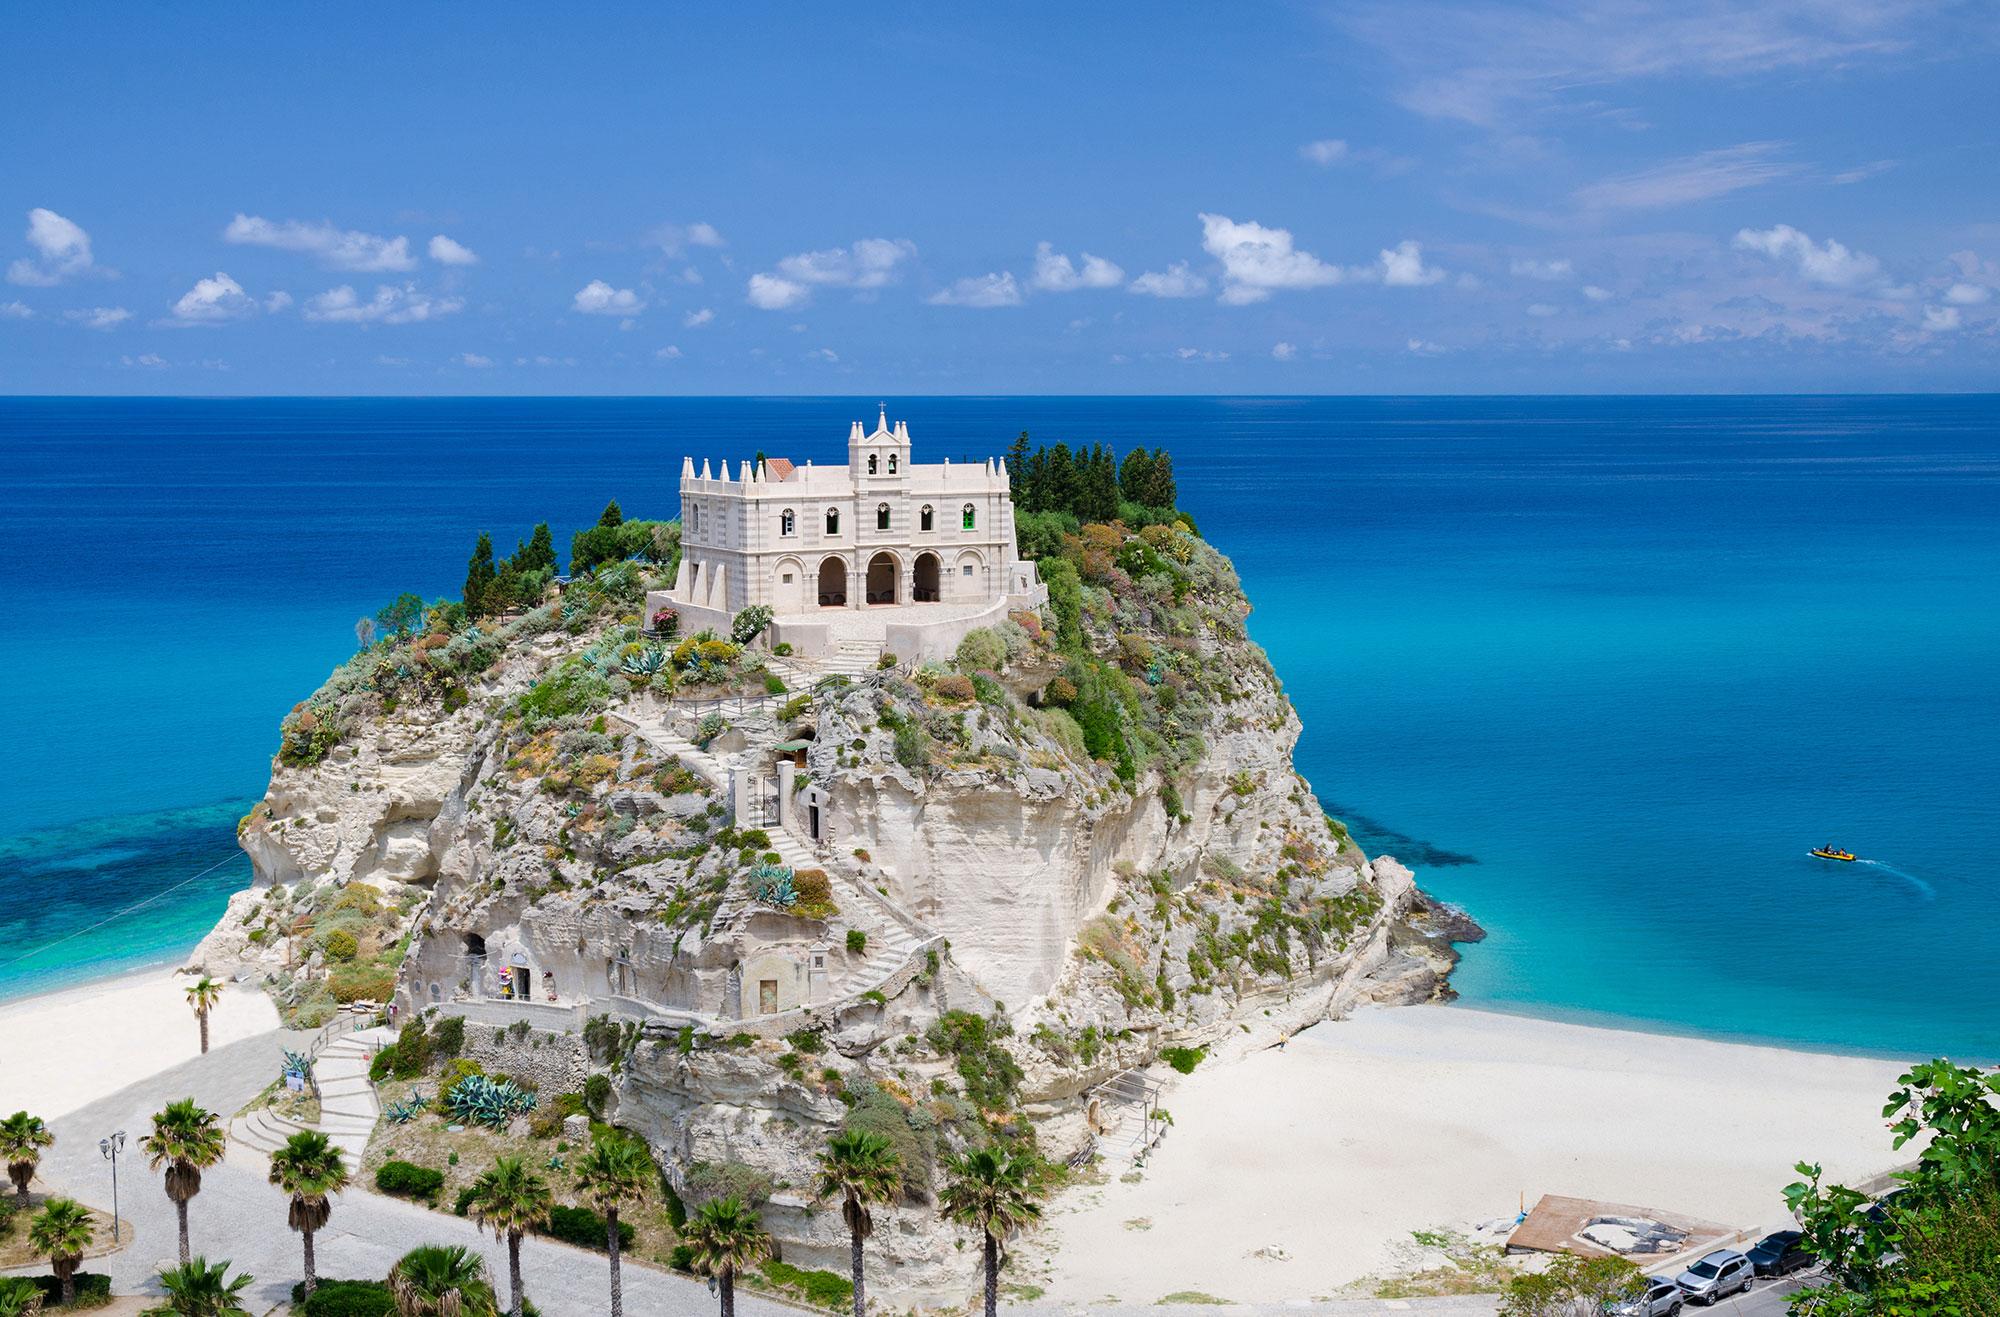 Santa Maria dell'Isola Tropea